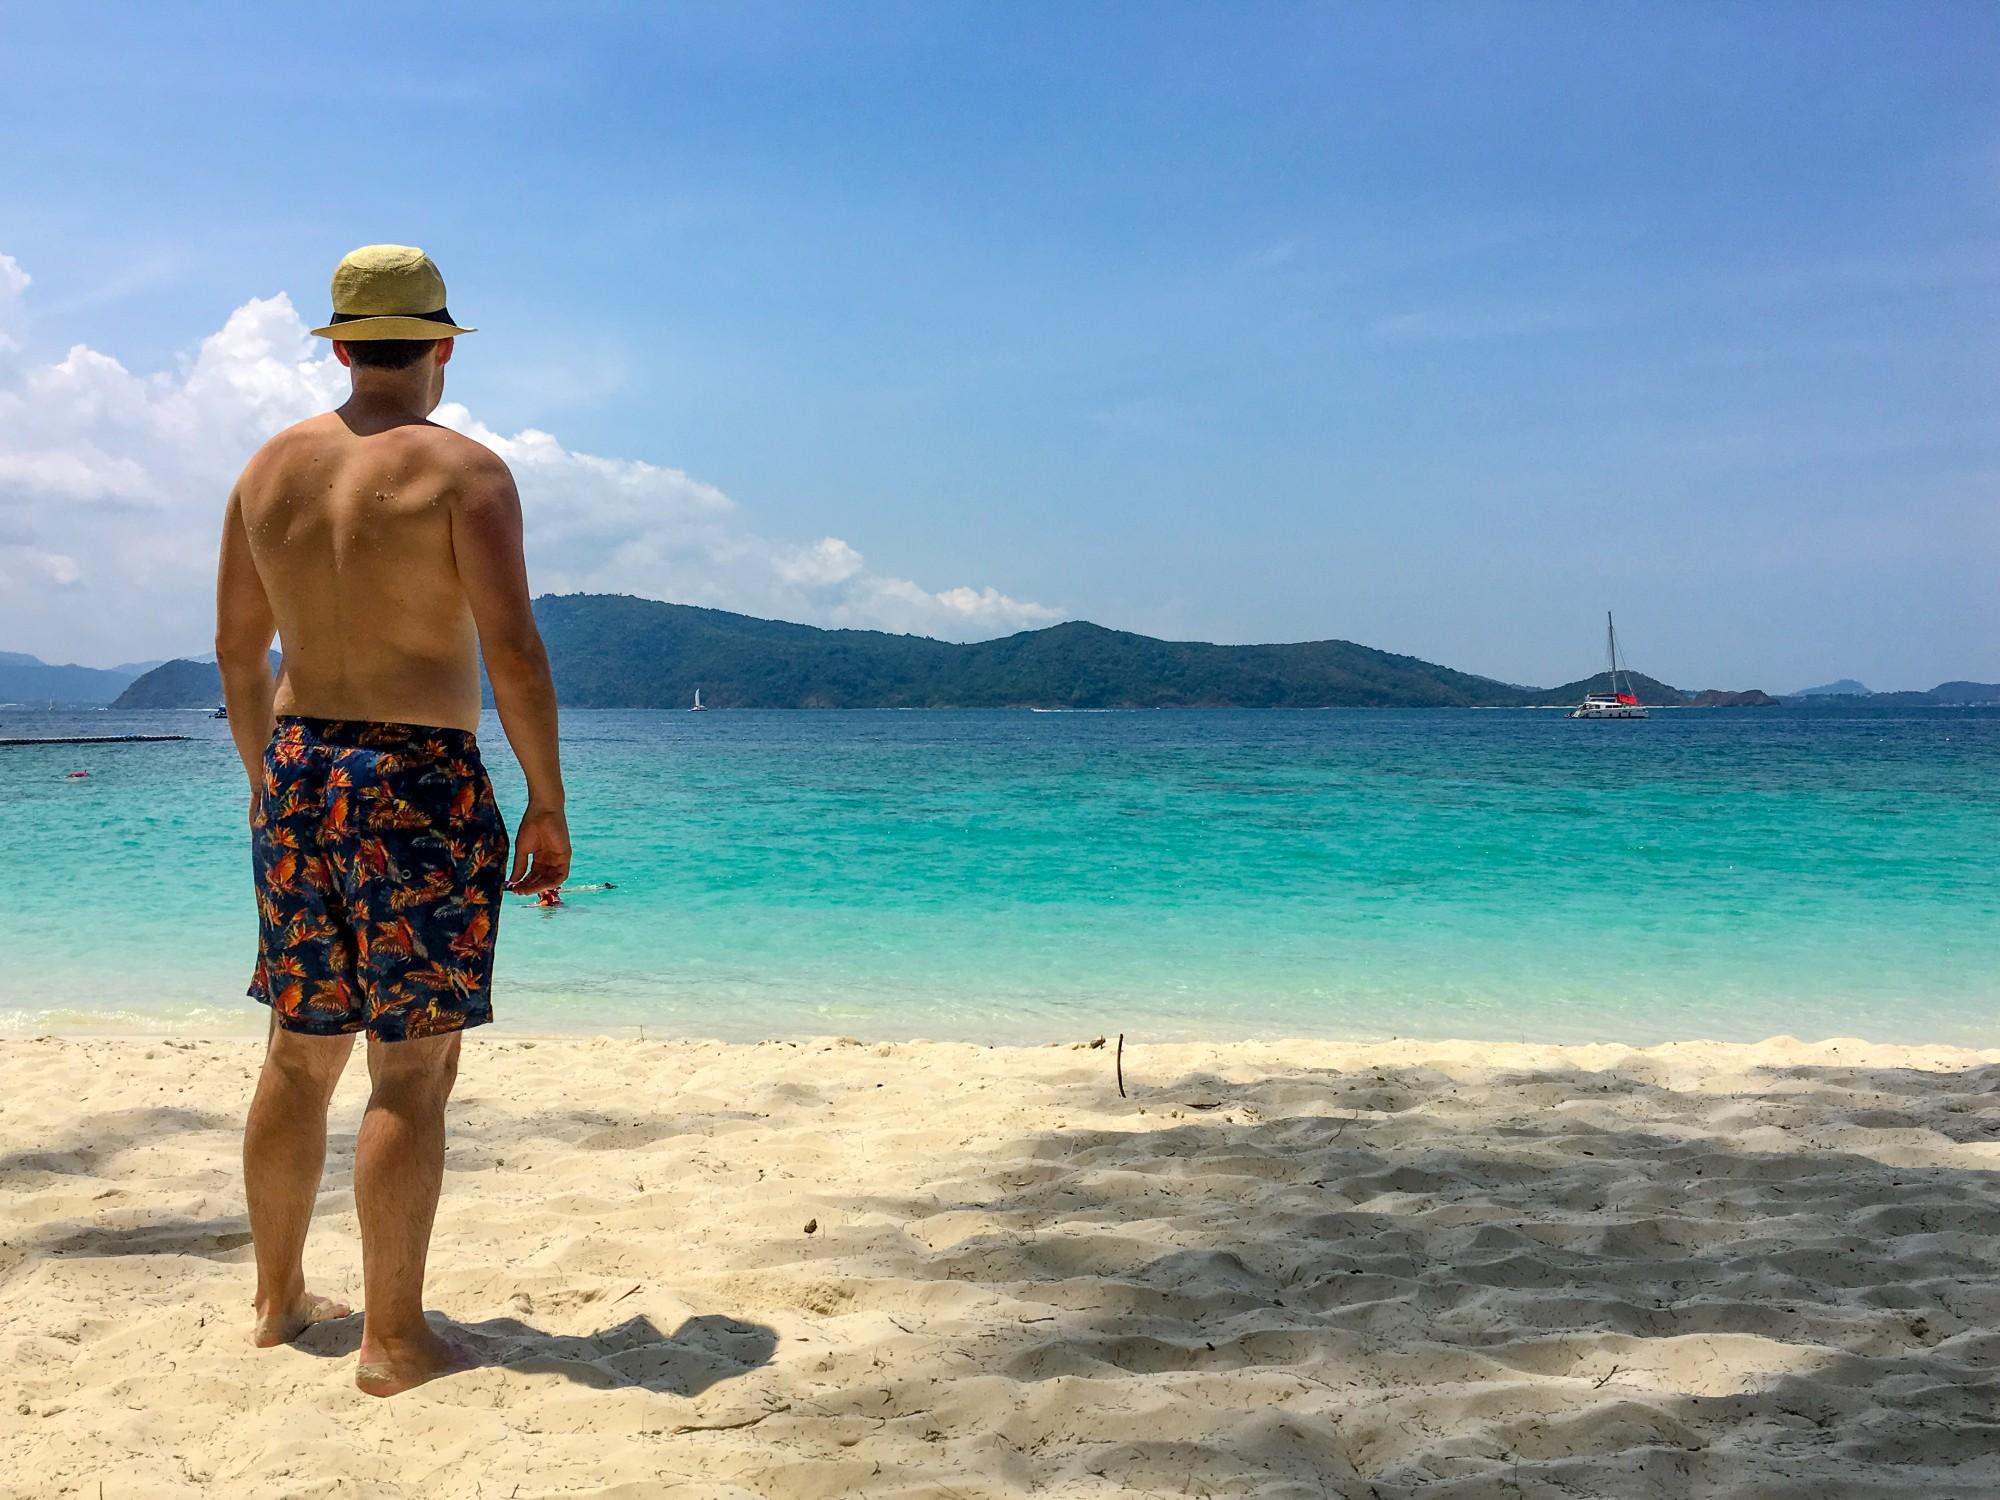 Coral Island, Phuket, Thailand